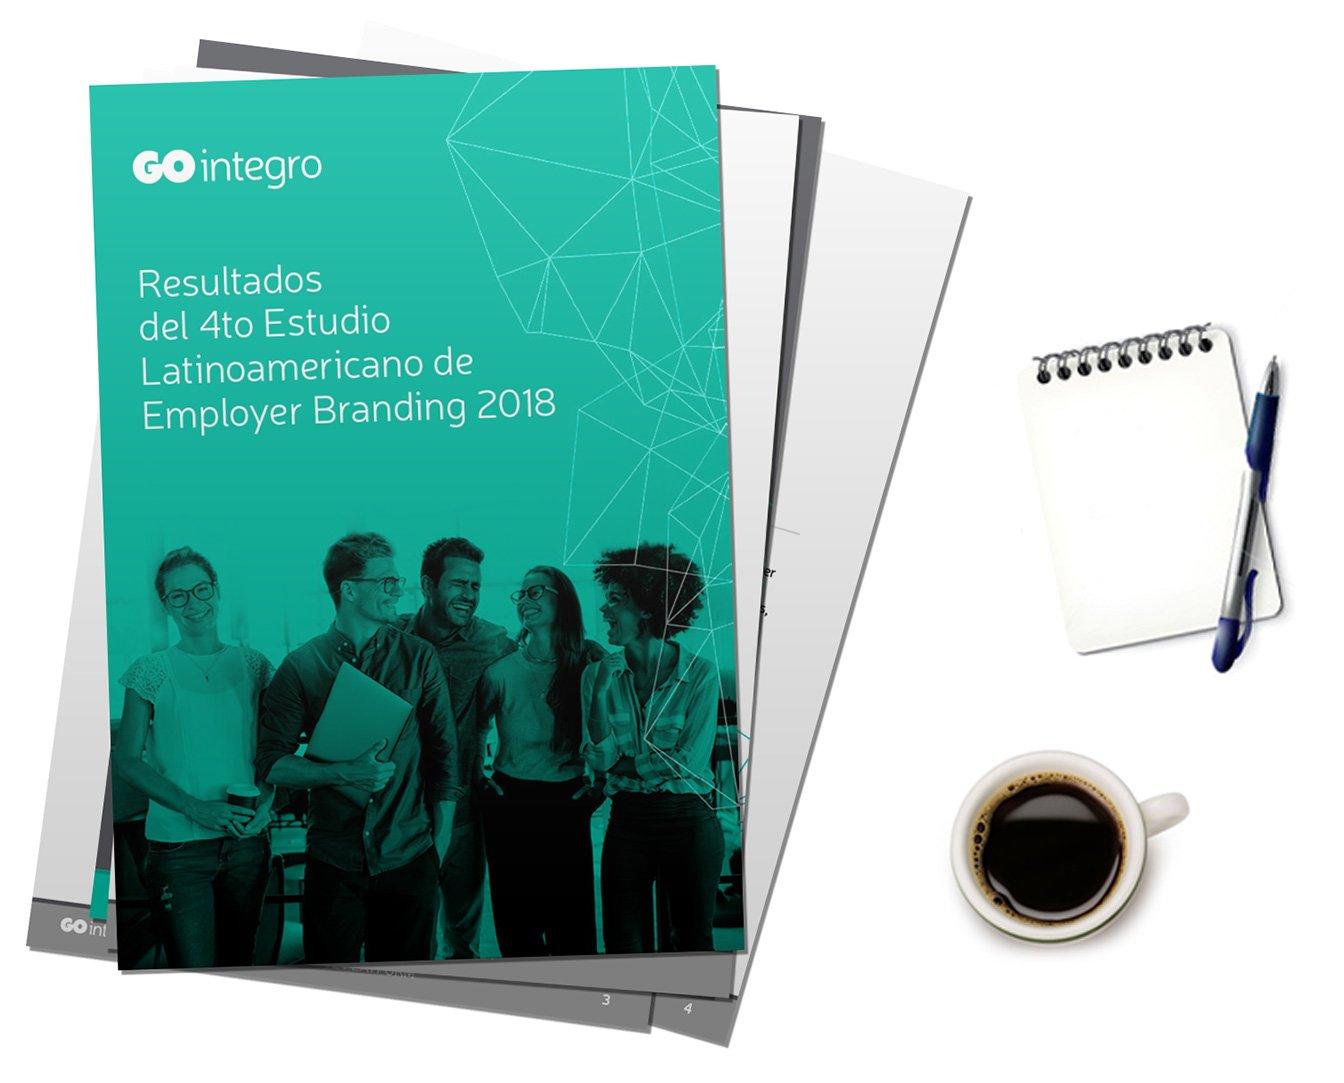 4to Estudio Latinoamericano de Employee Branding